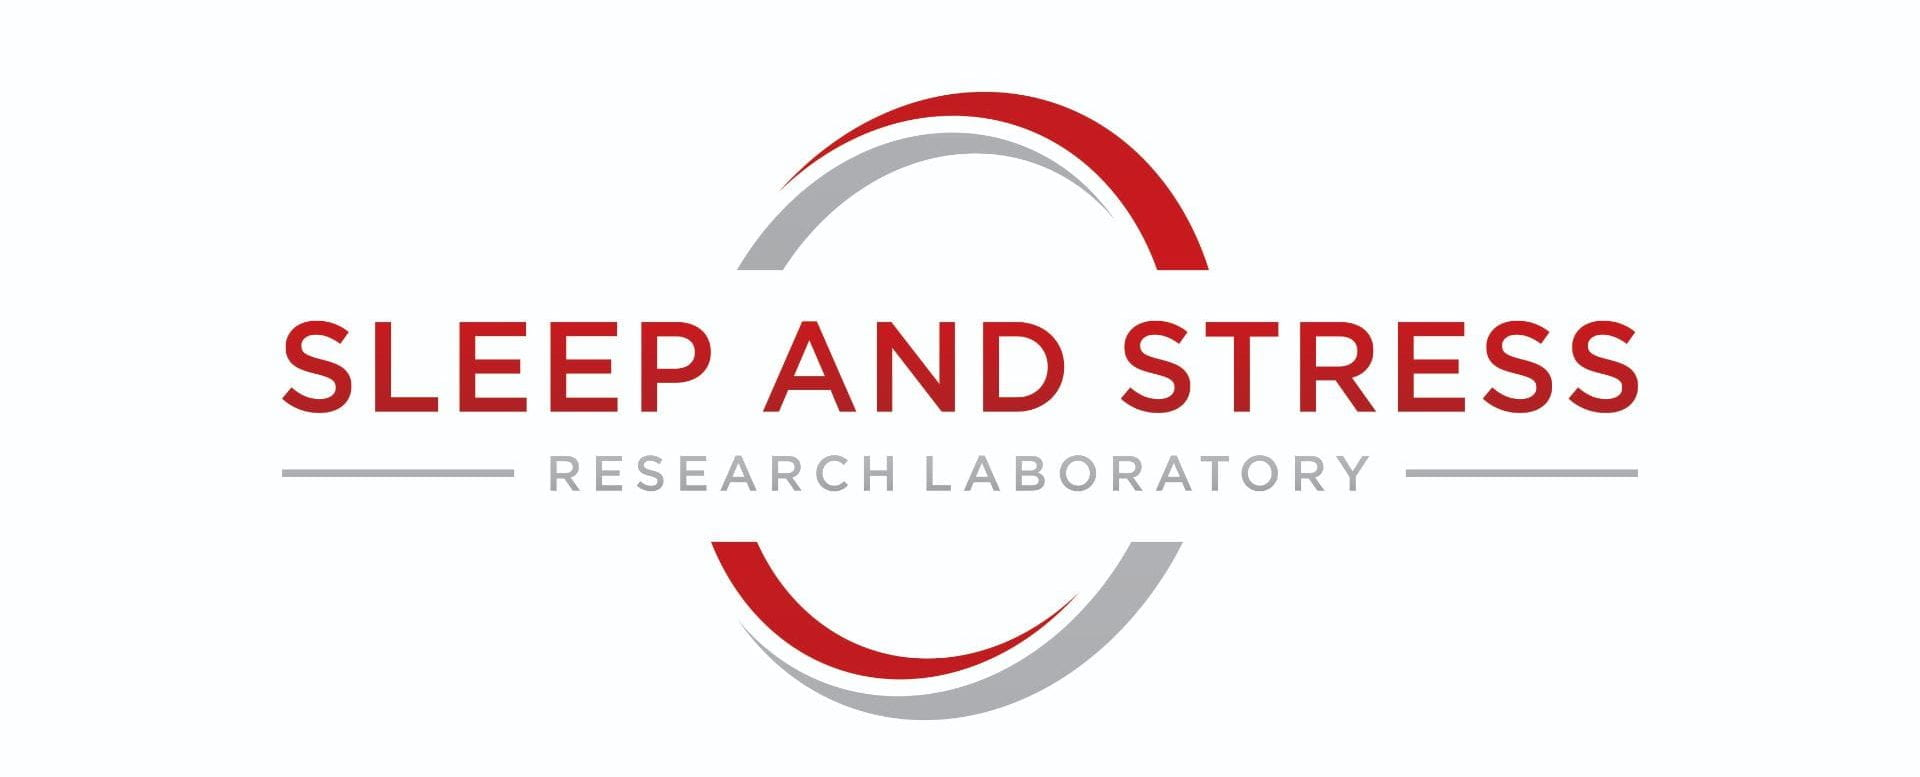 SLEEP & STRESS RESEARCH LAB